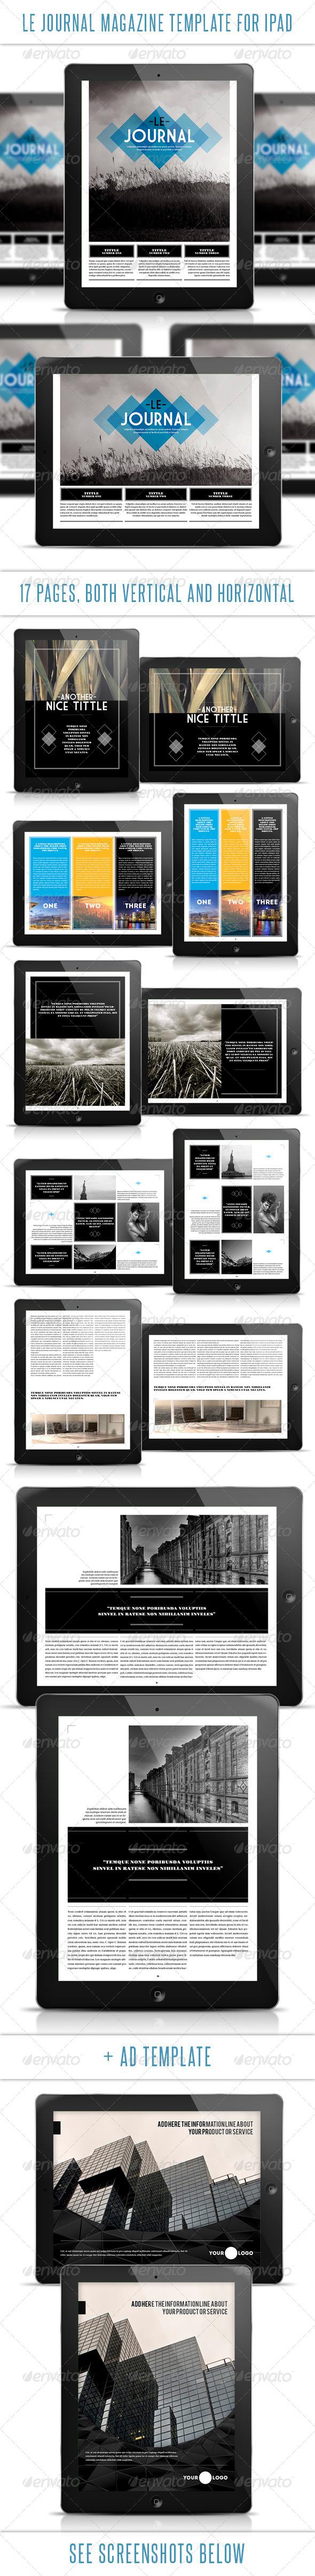 Le Journal Tablet Magazine Template - Digital Magazines ePublishing